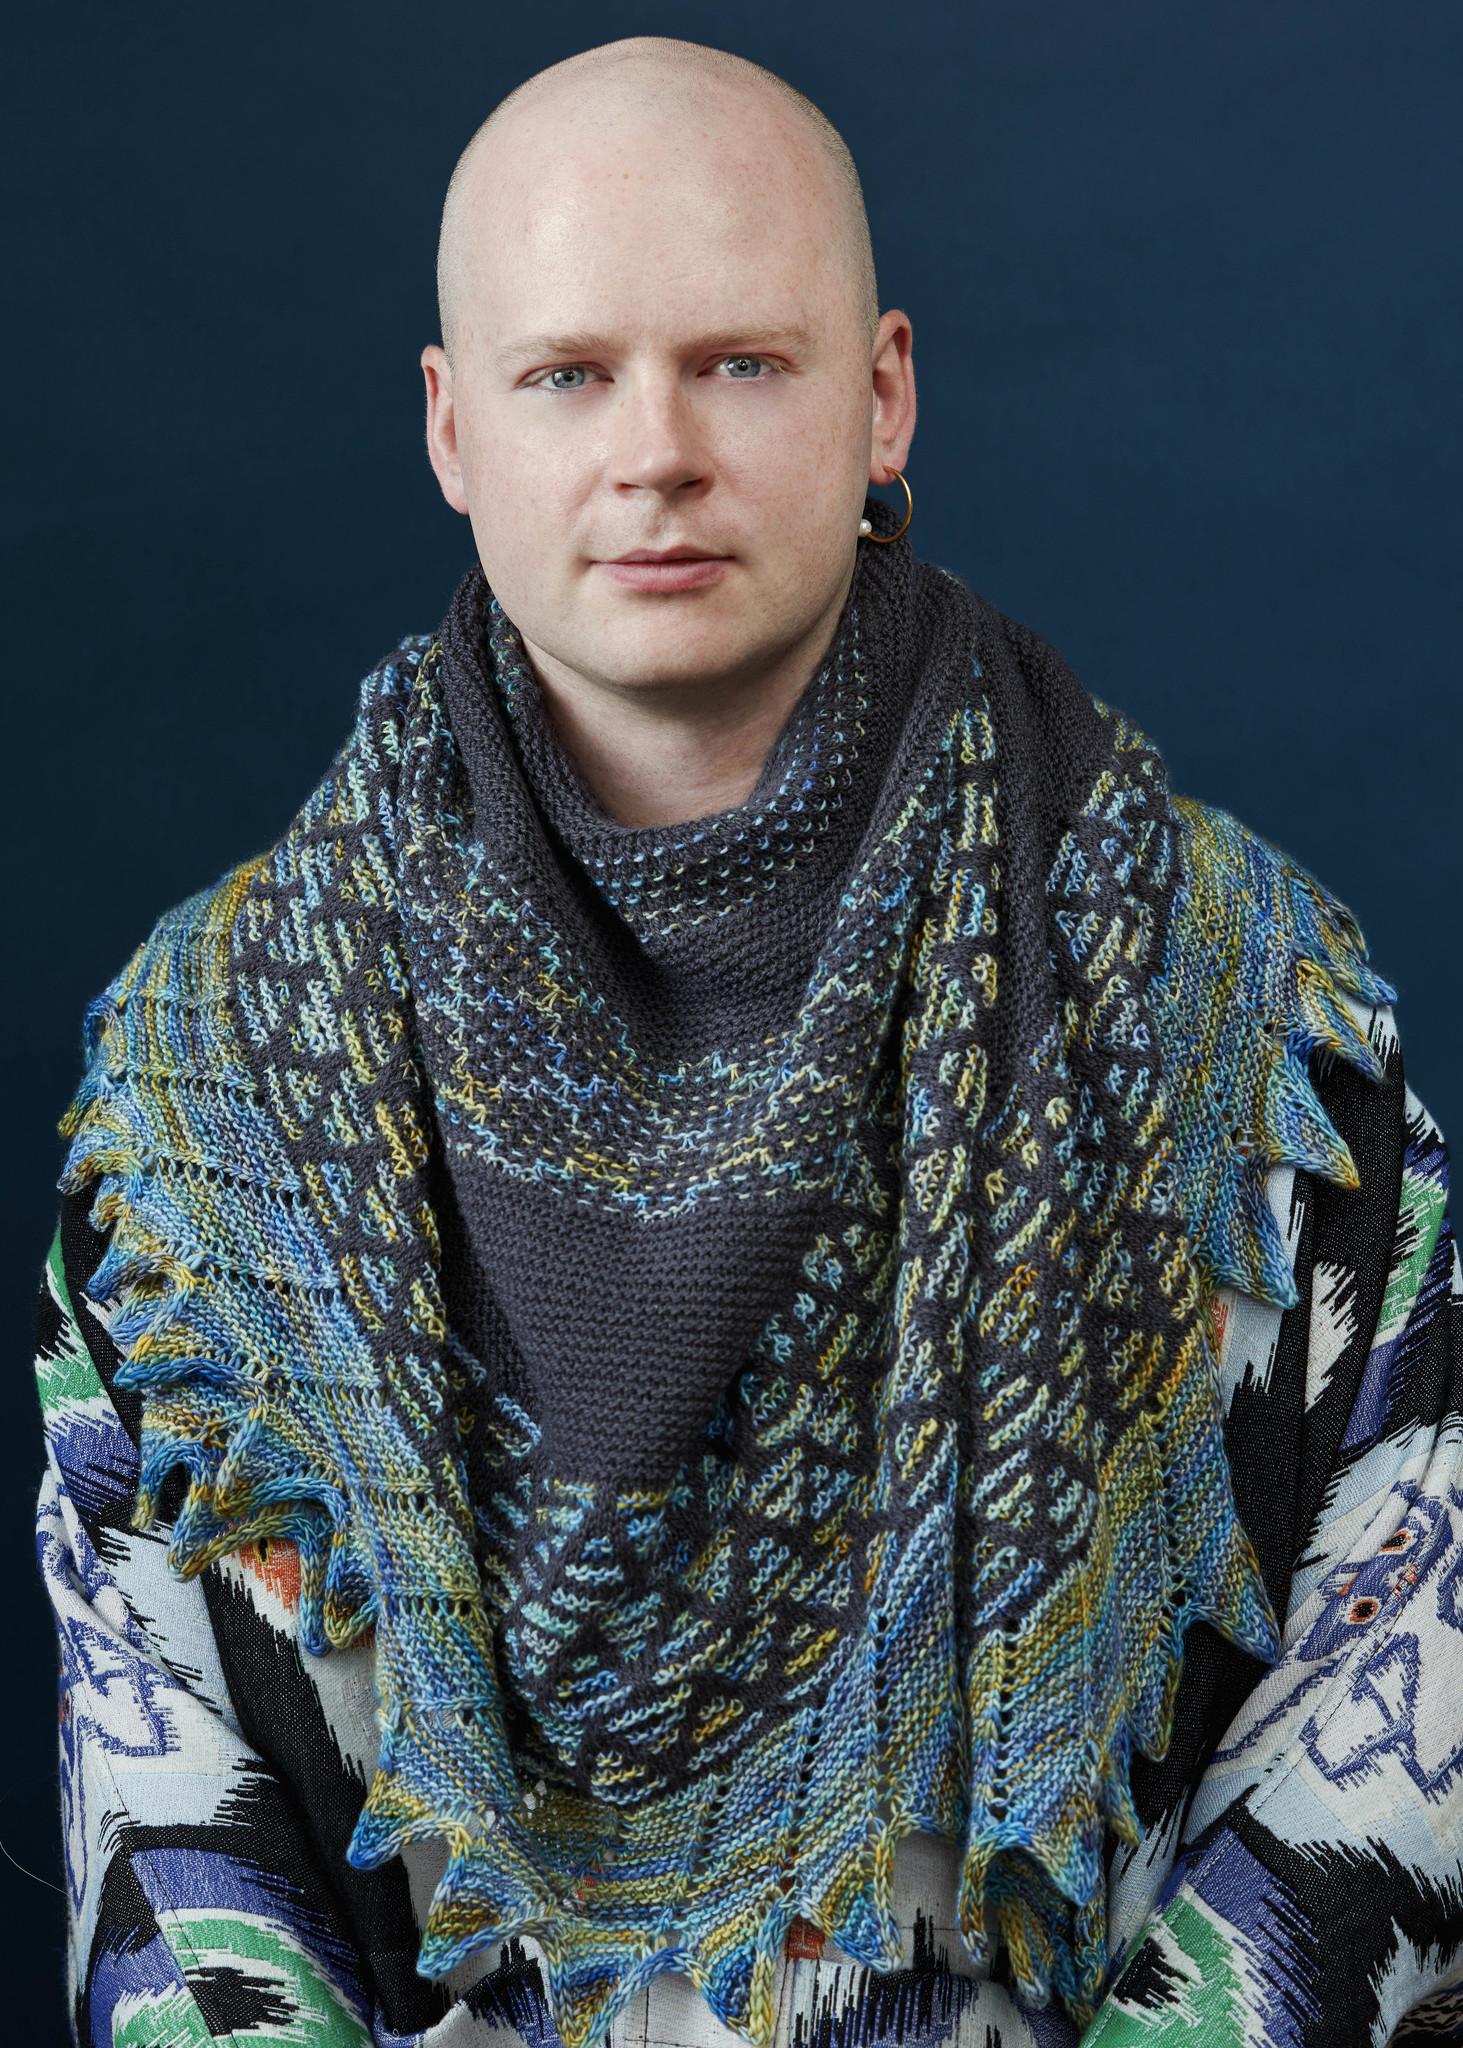 Westknits WESTKNITS KIT MOSAIC MUSINGS - TEAL